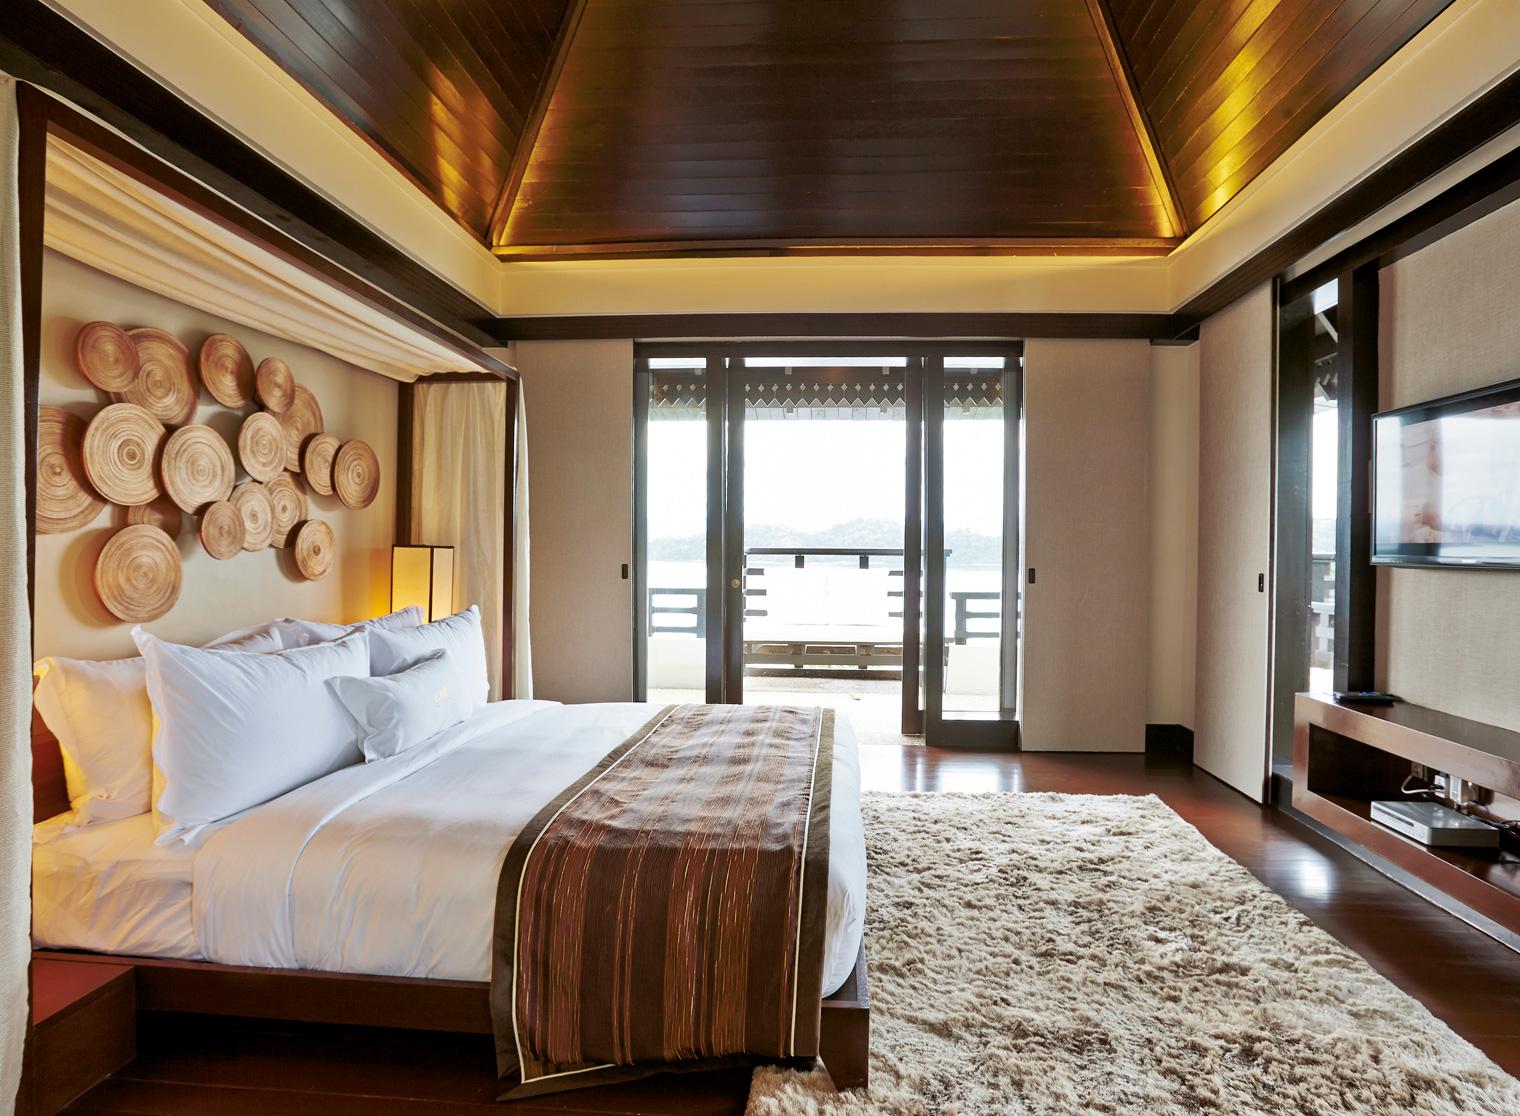 Rooms: Pulau Gaya Island Accommodation